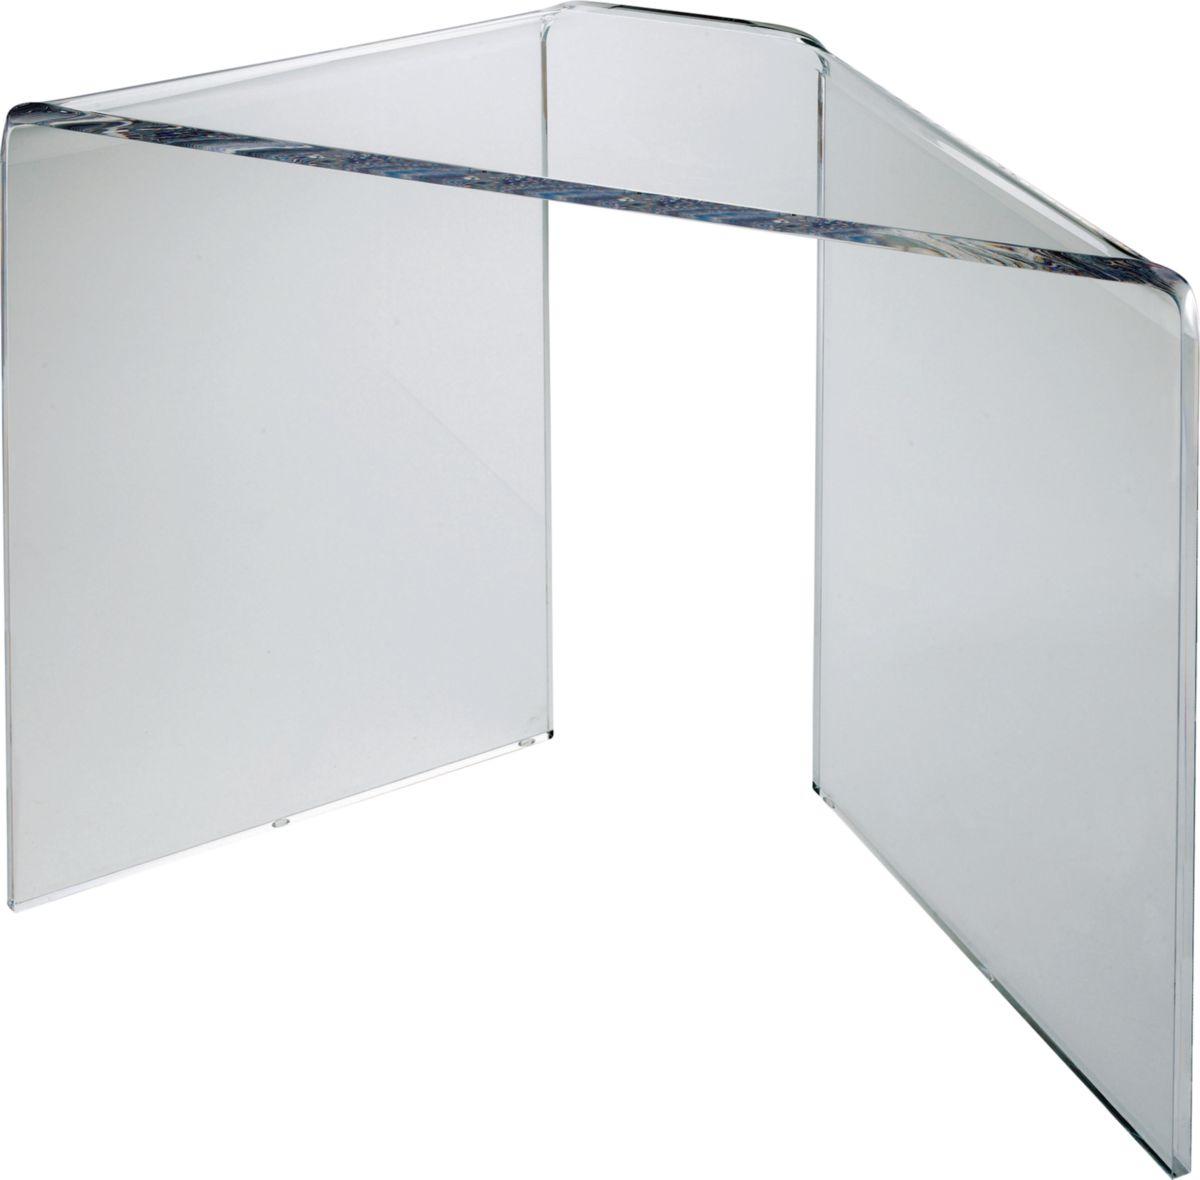 Siège d\'angle indépendant transparent réf L1900872 - LEDA ...